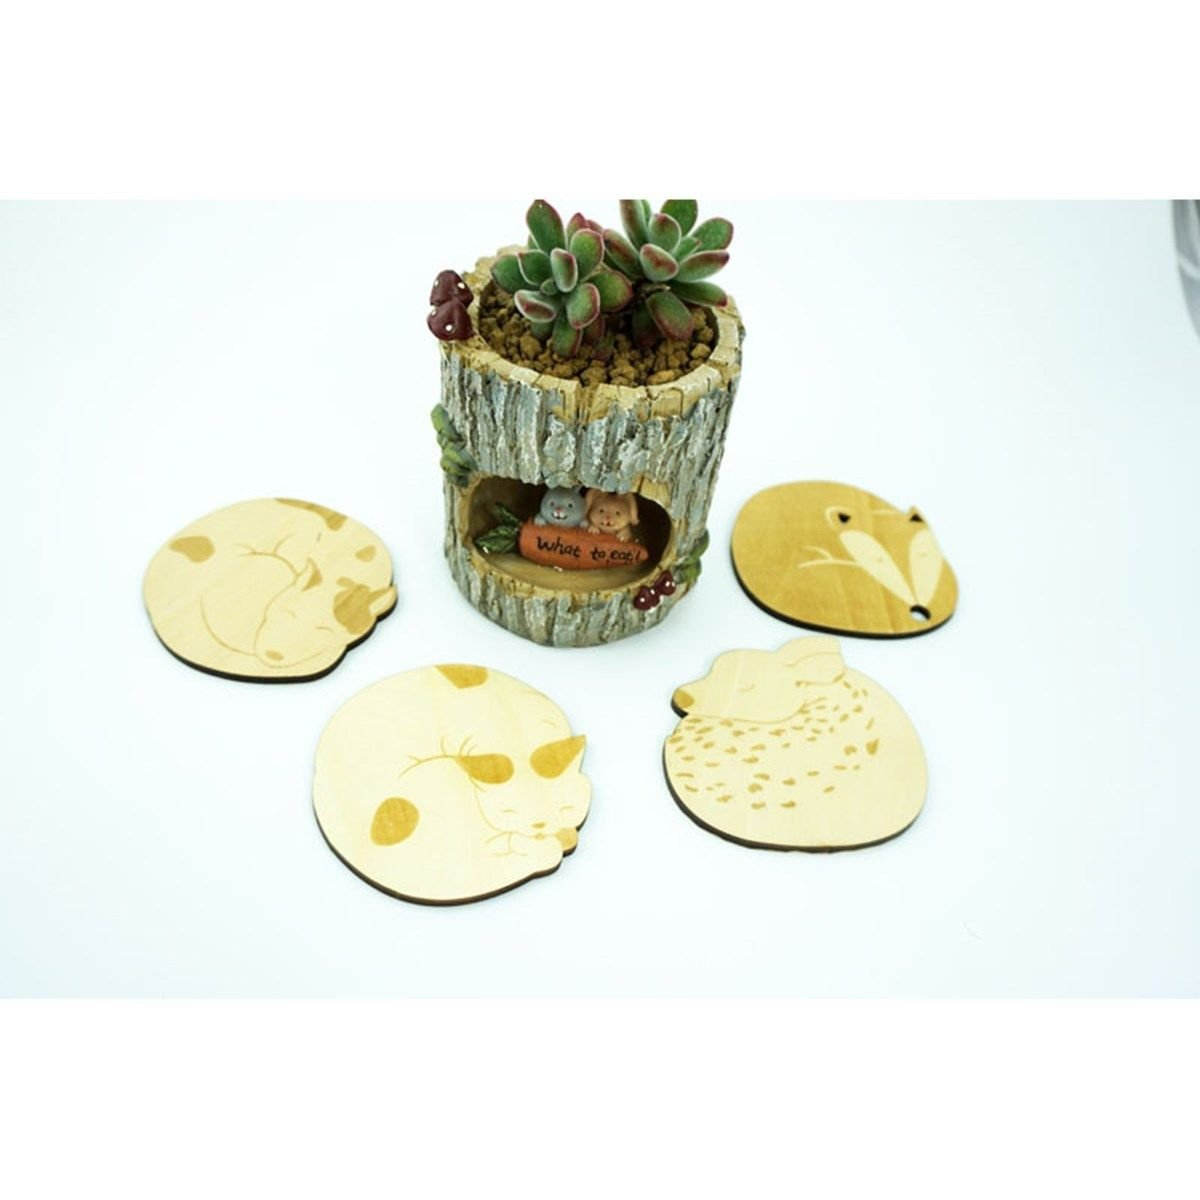 5pcs/set Premium Practical Cartoon Animal Wooden Coasters Heat Insulation Pad